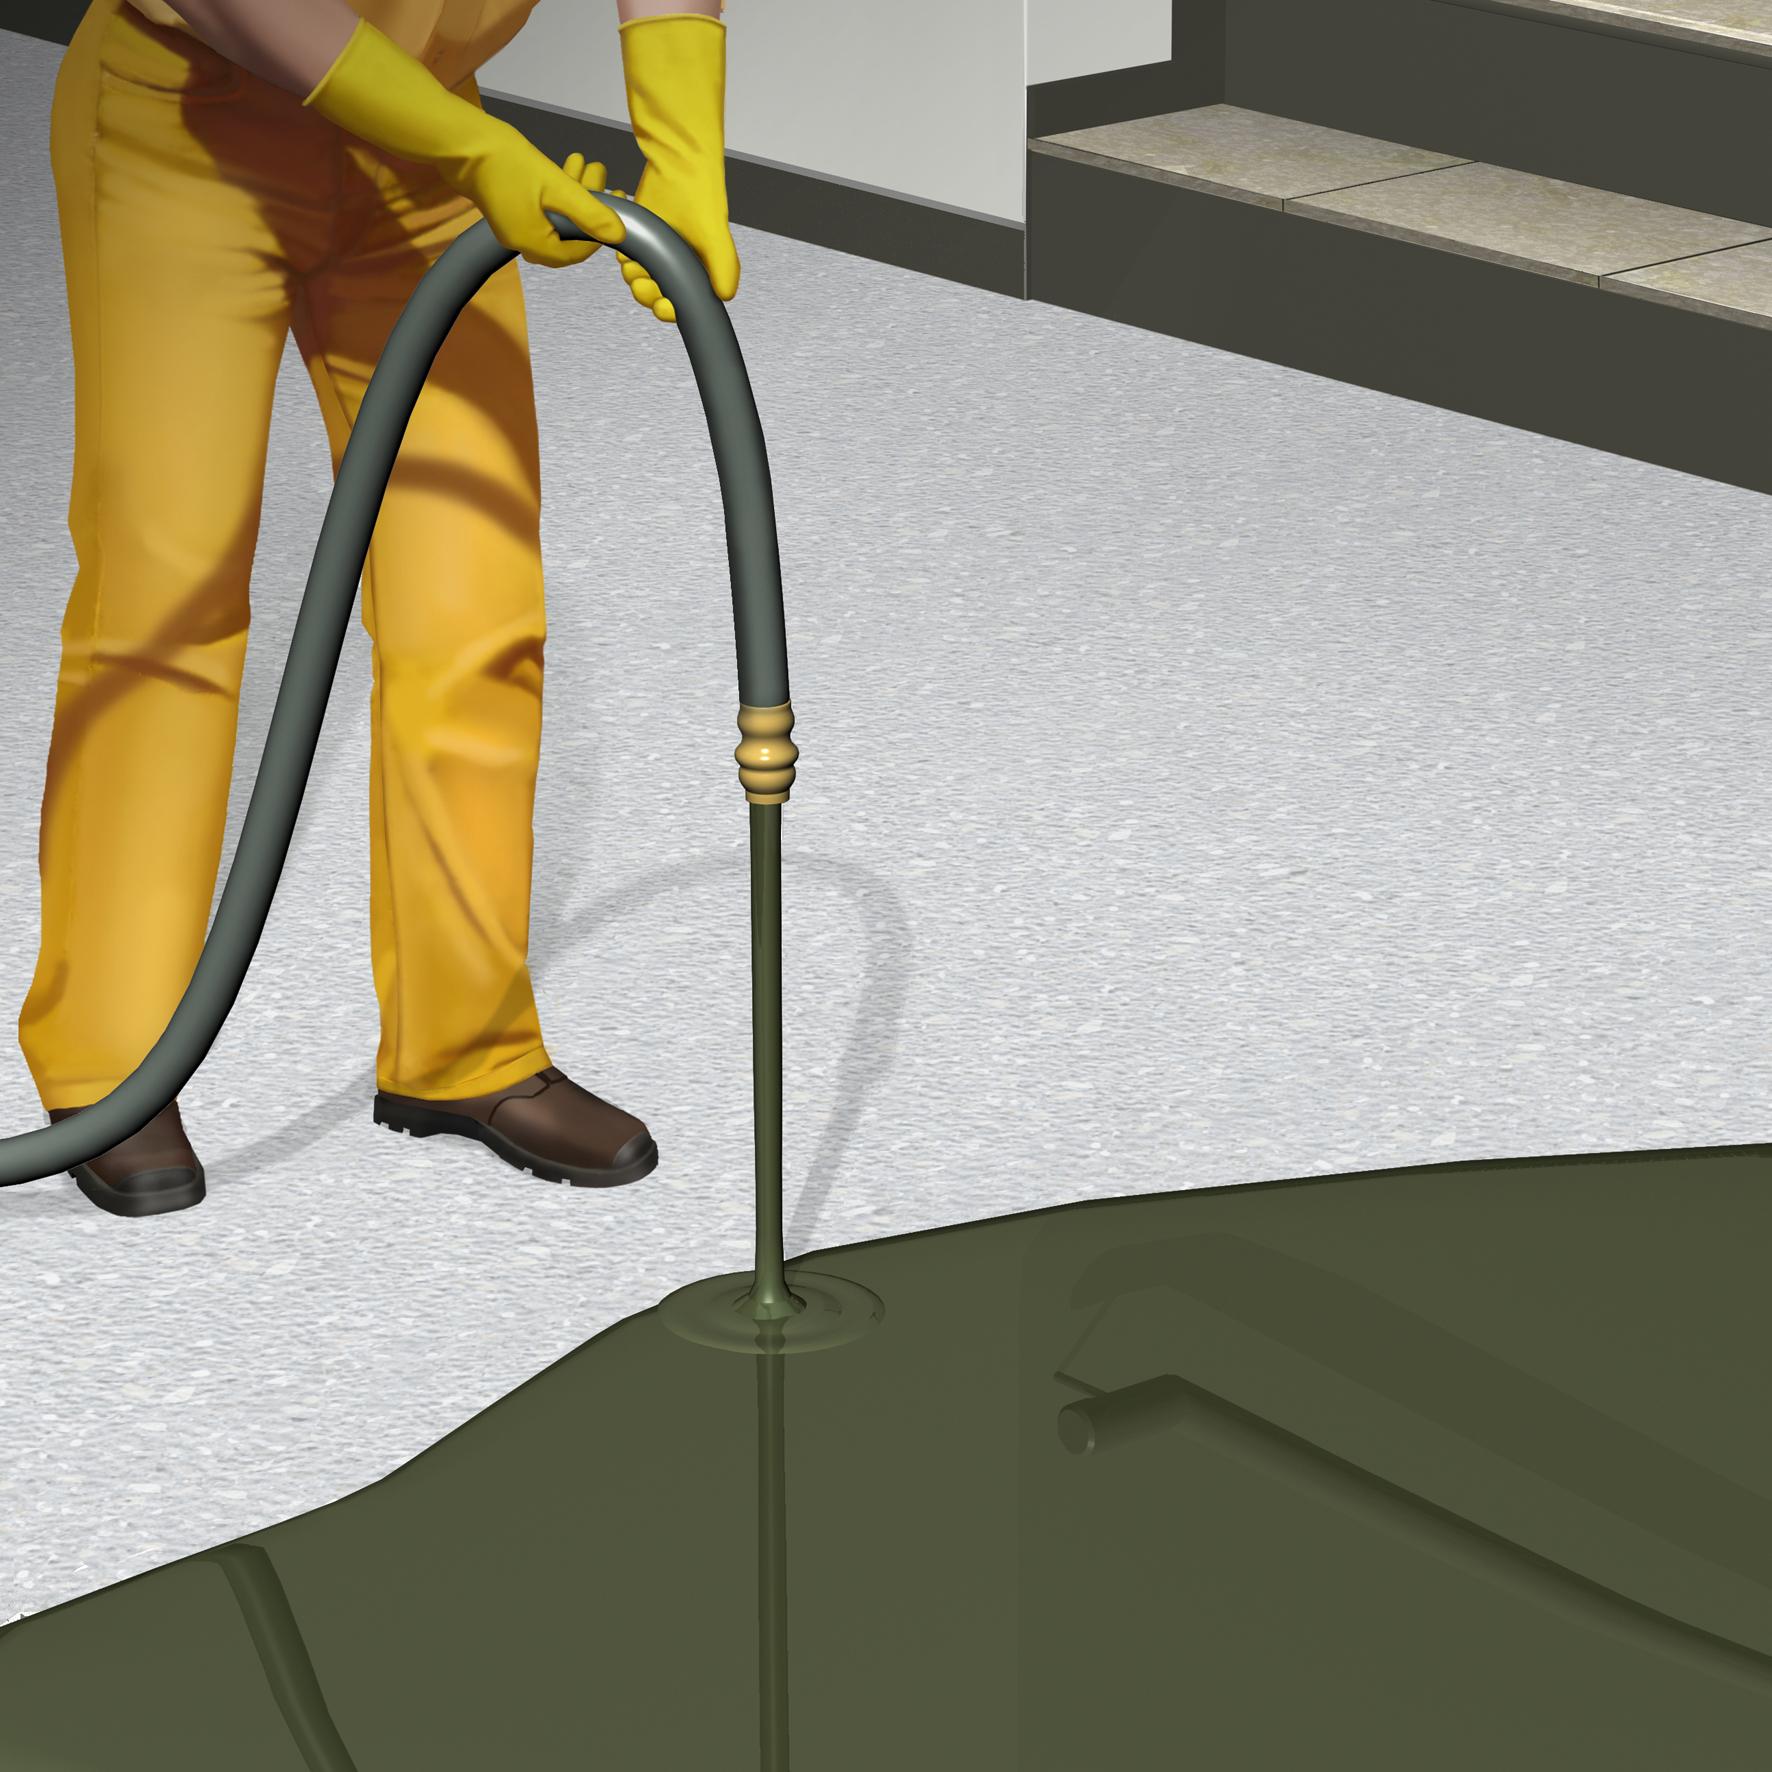 Sapa autonivelanta pe baza de ciment cu intarire rapida - Produs si aplicare SIKA - Poza 2